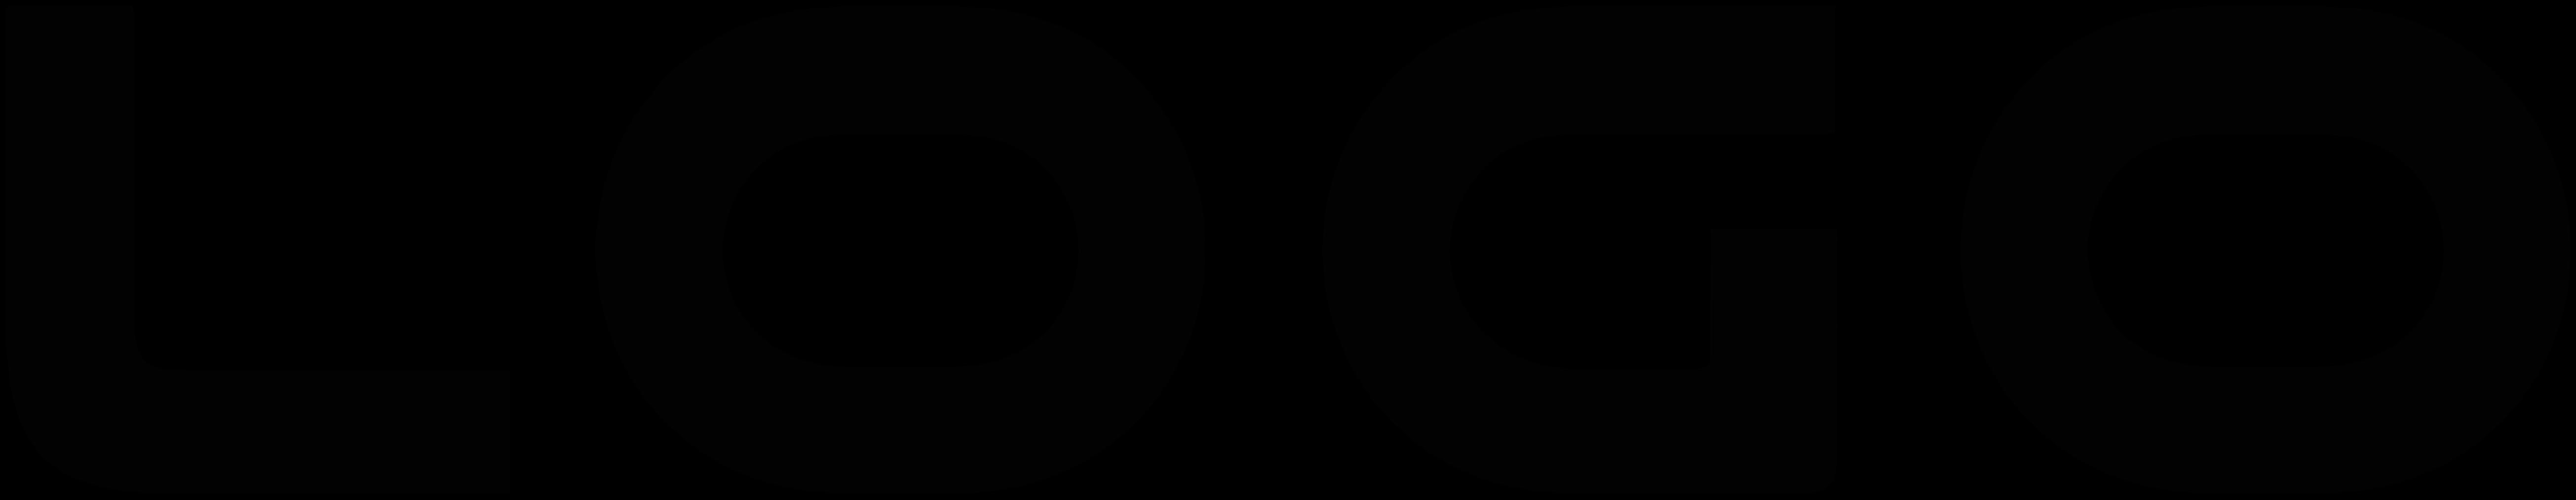 logo logo landau schwarz